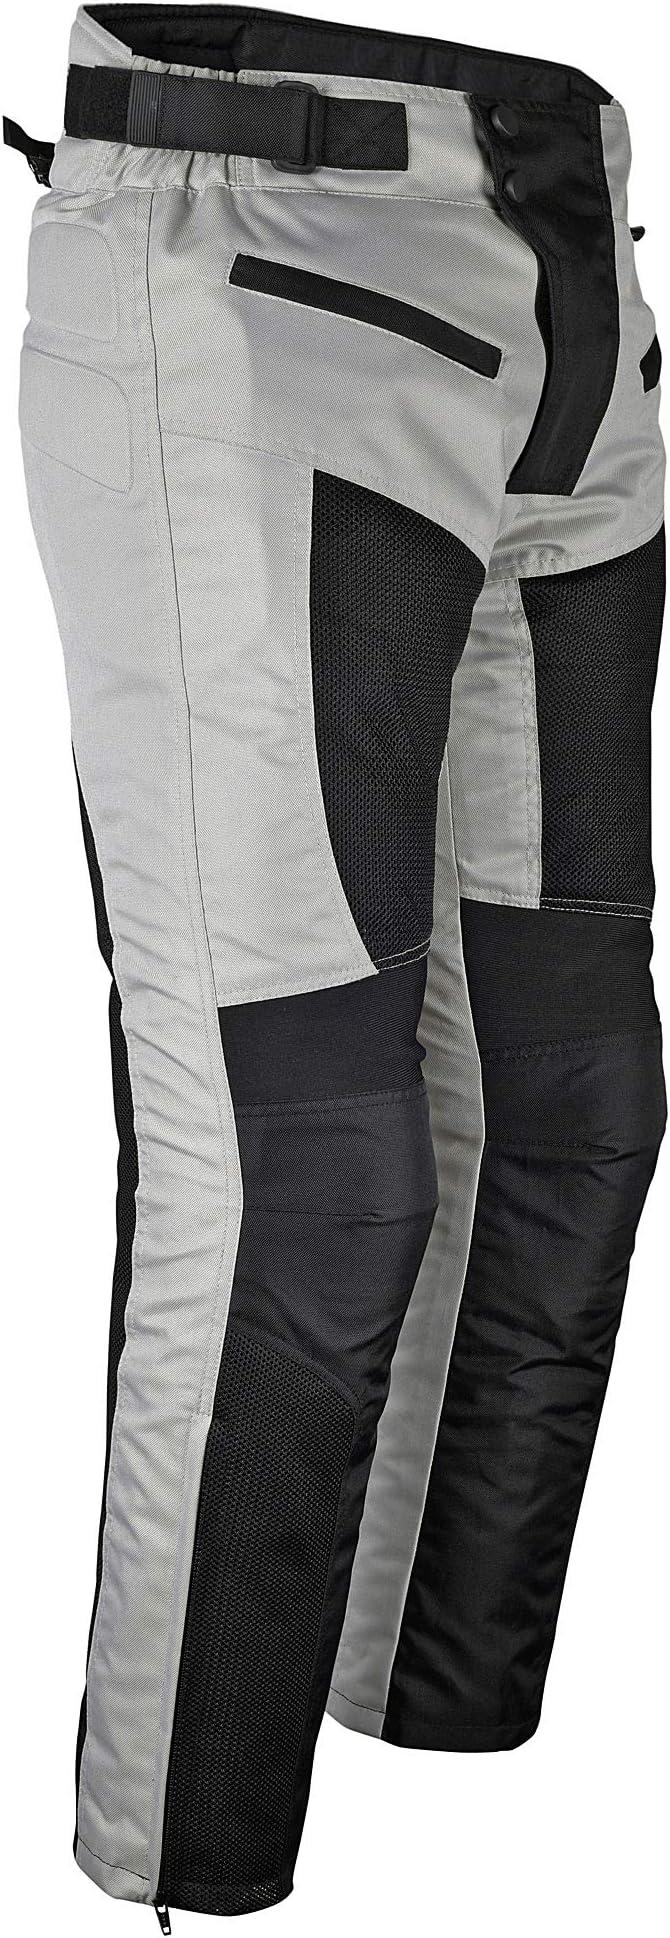 Medium//Black Cortech GX Sport Pants